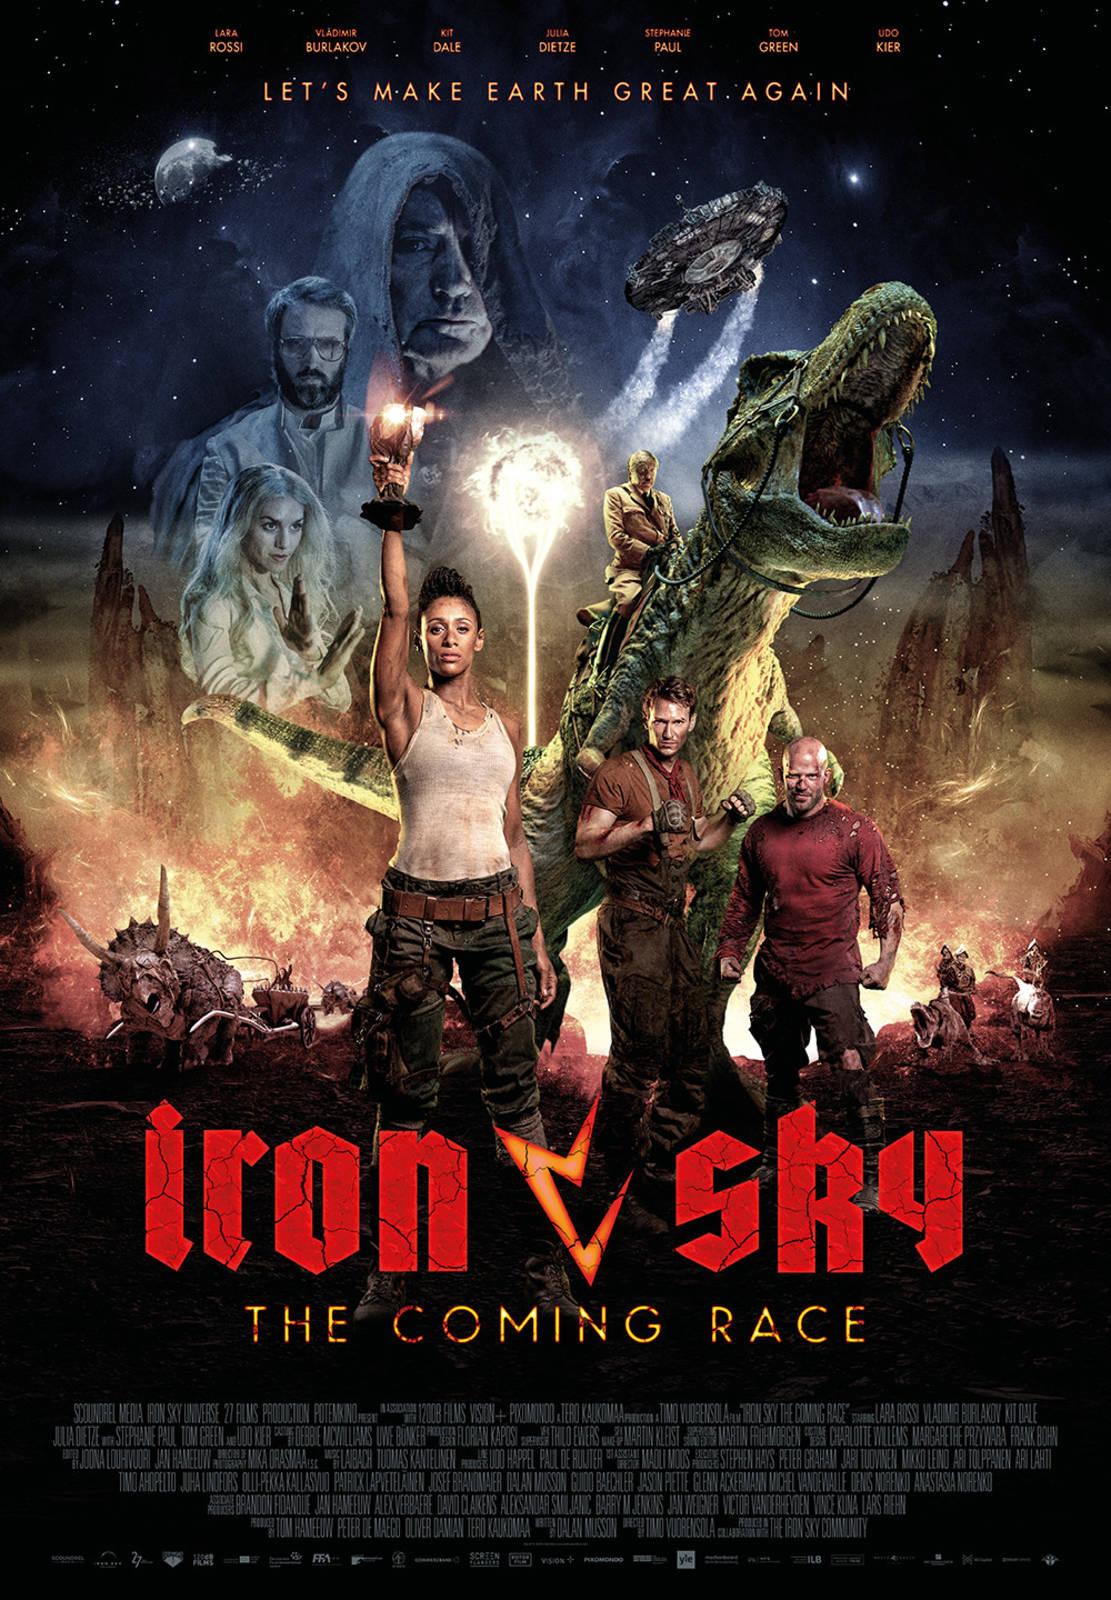 iron sky 2 stream